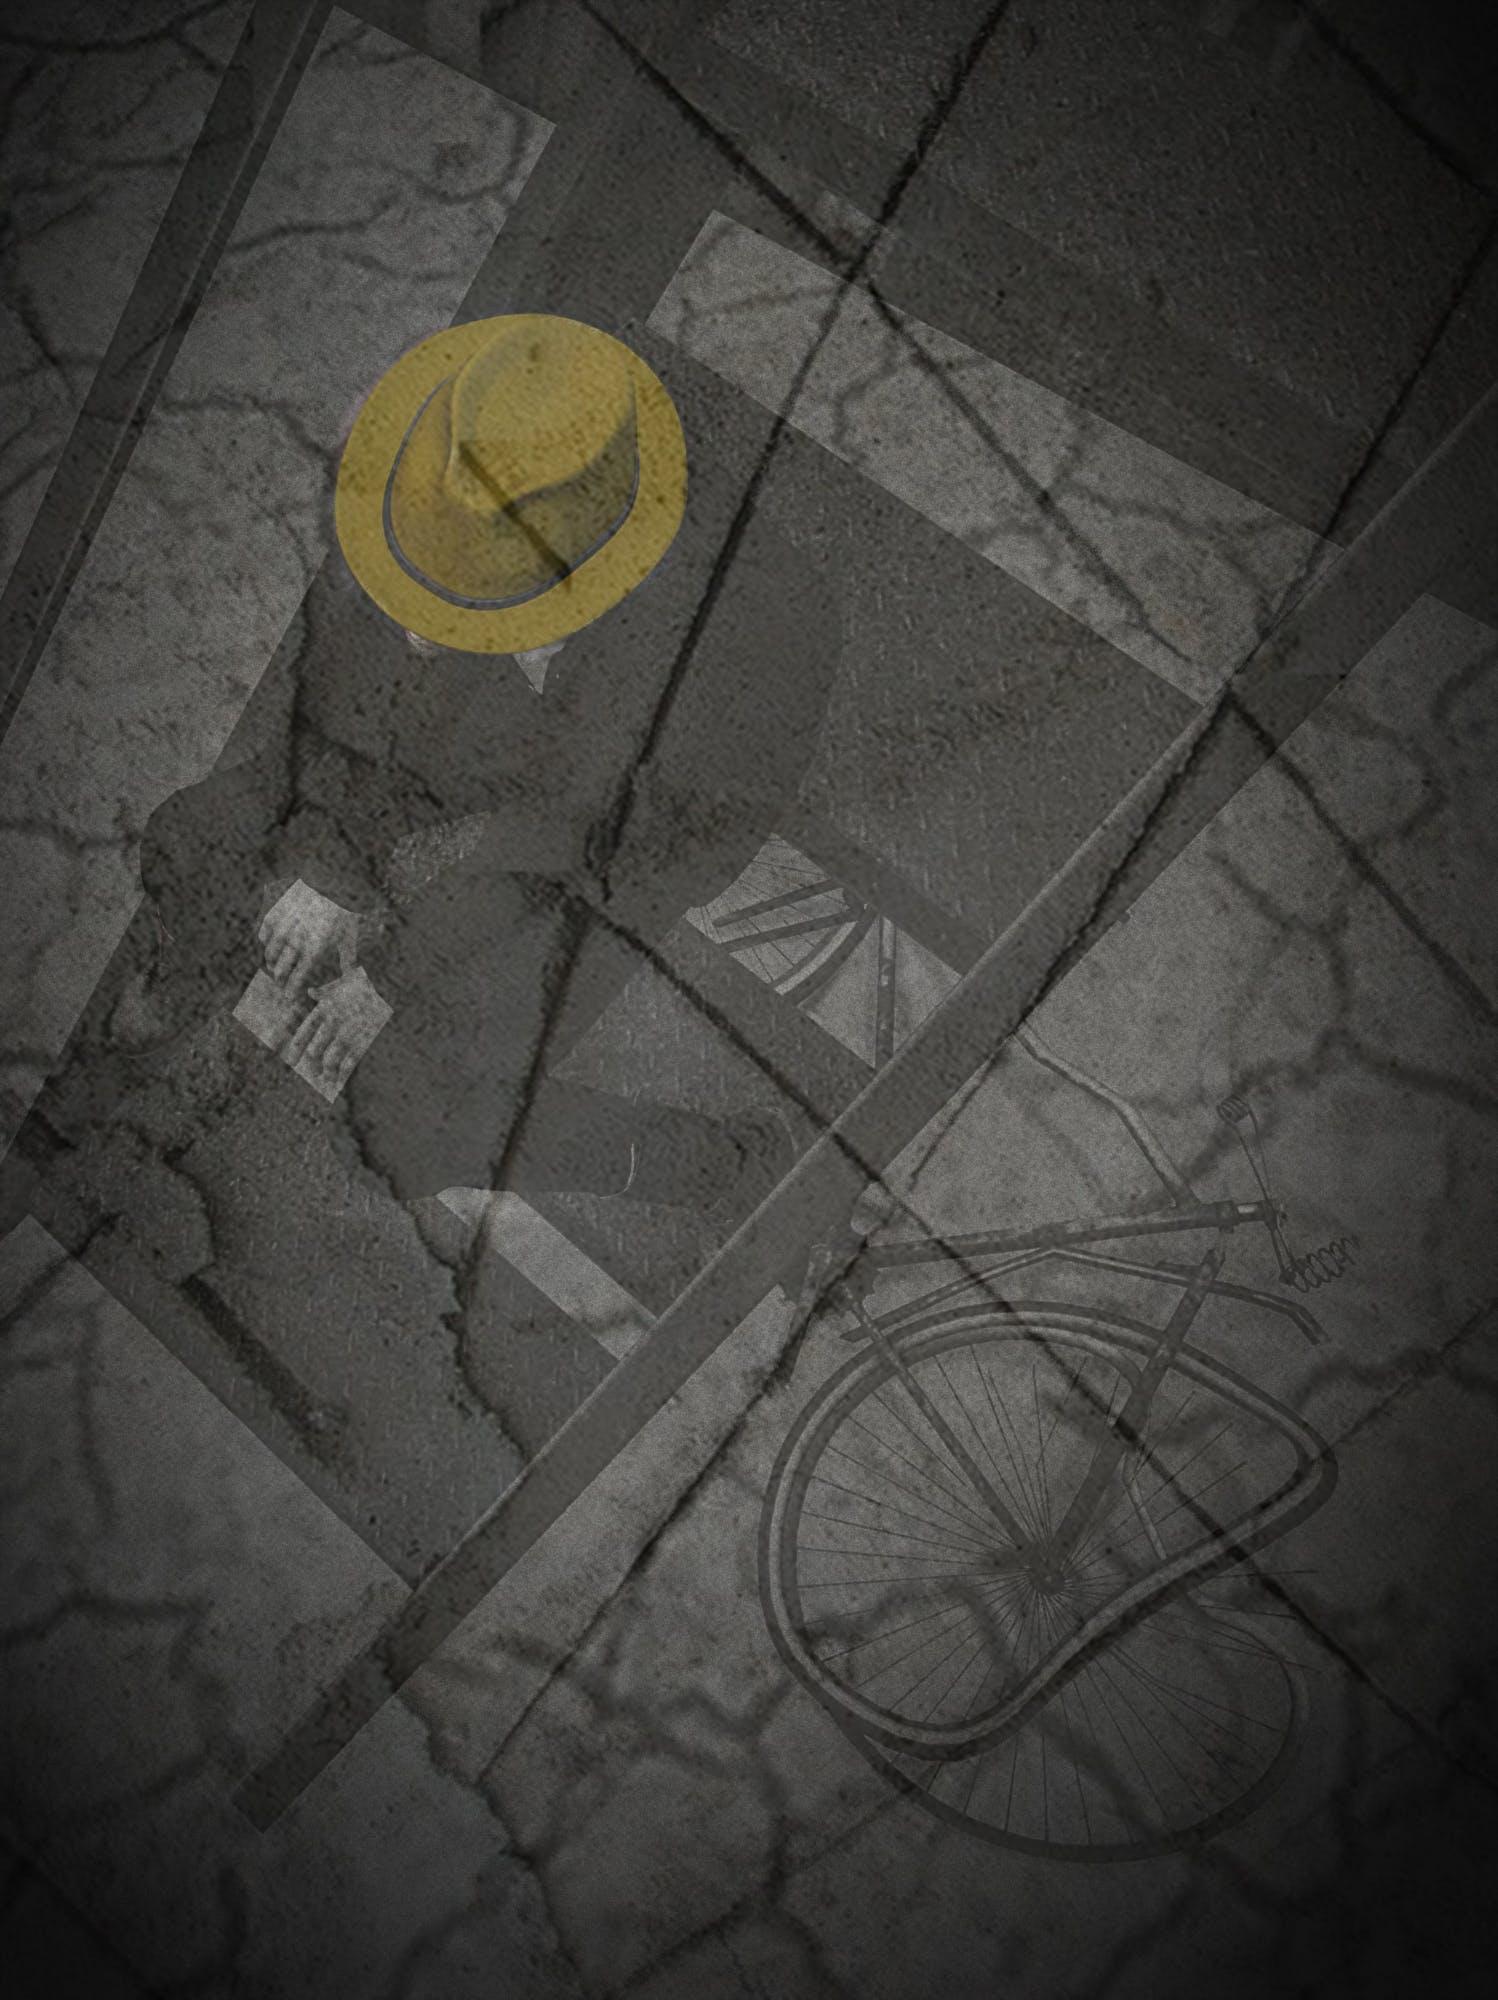 Free stock photo of man, yellow, broken, hat